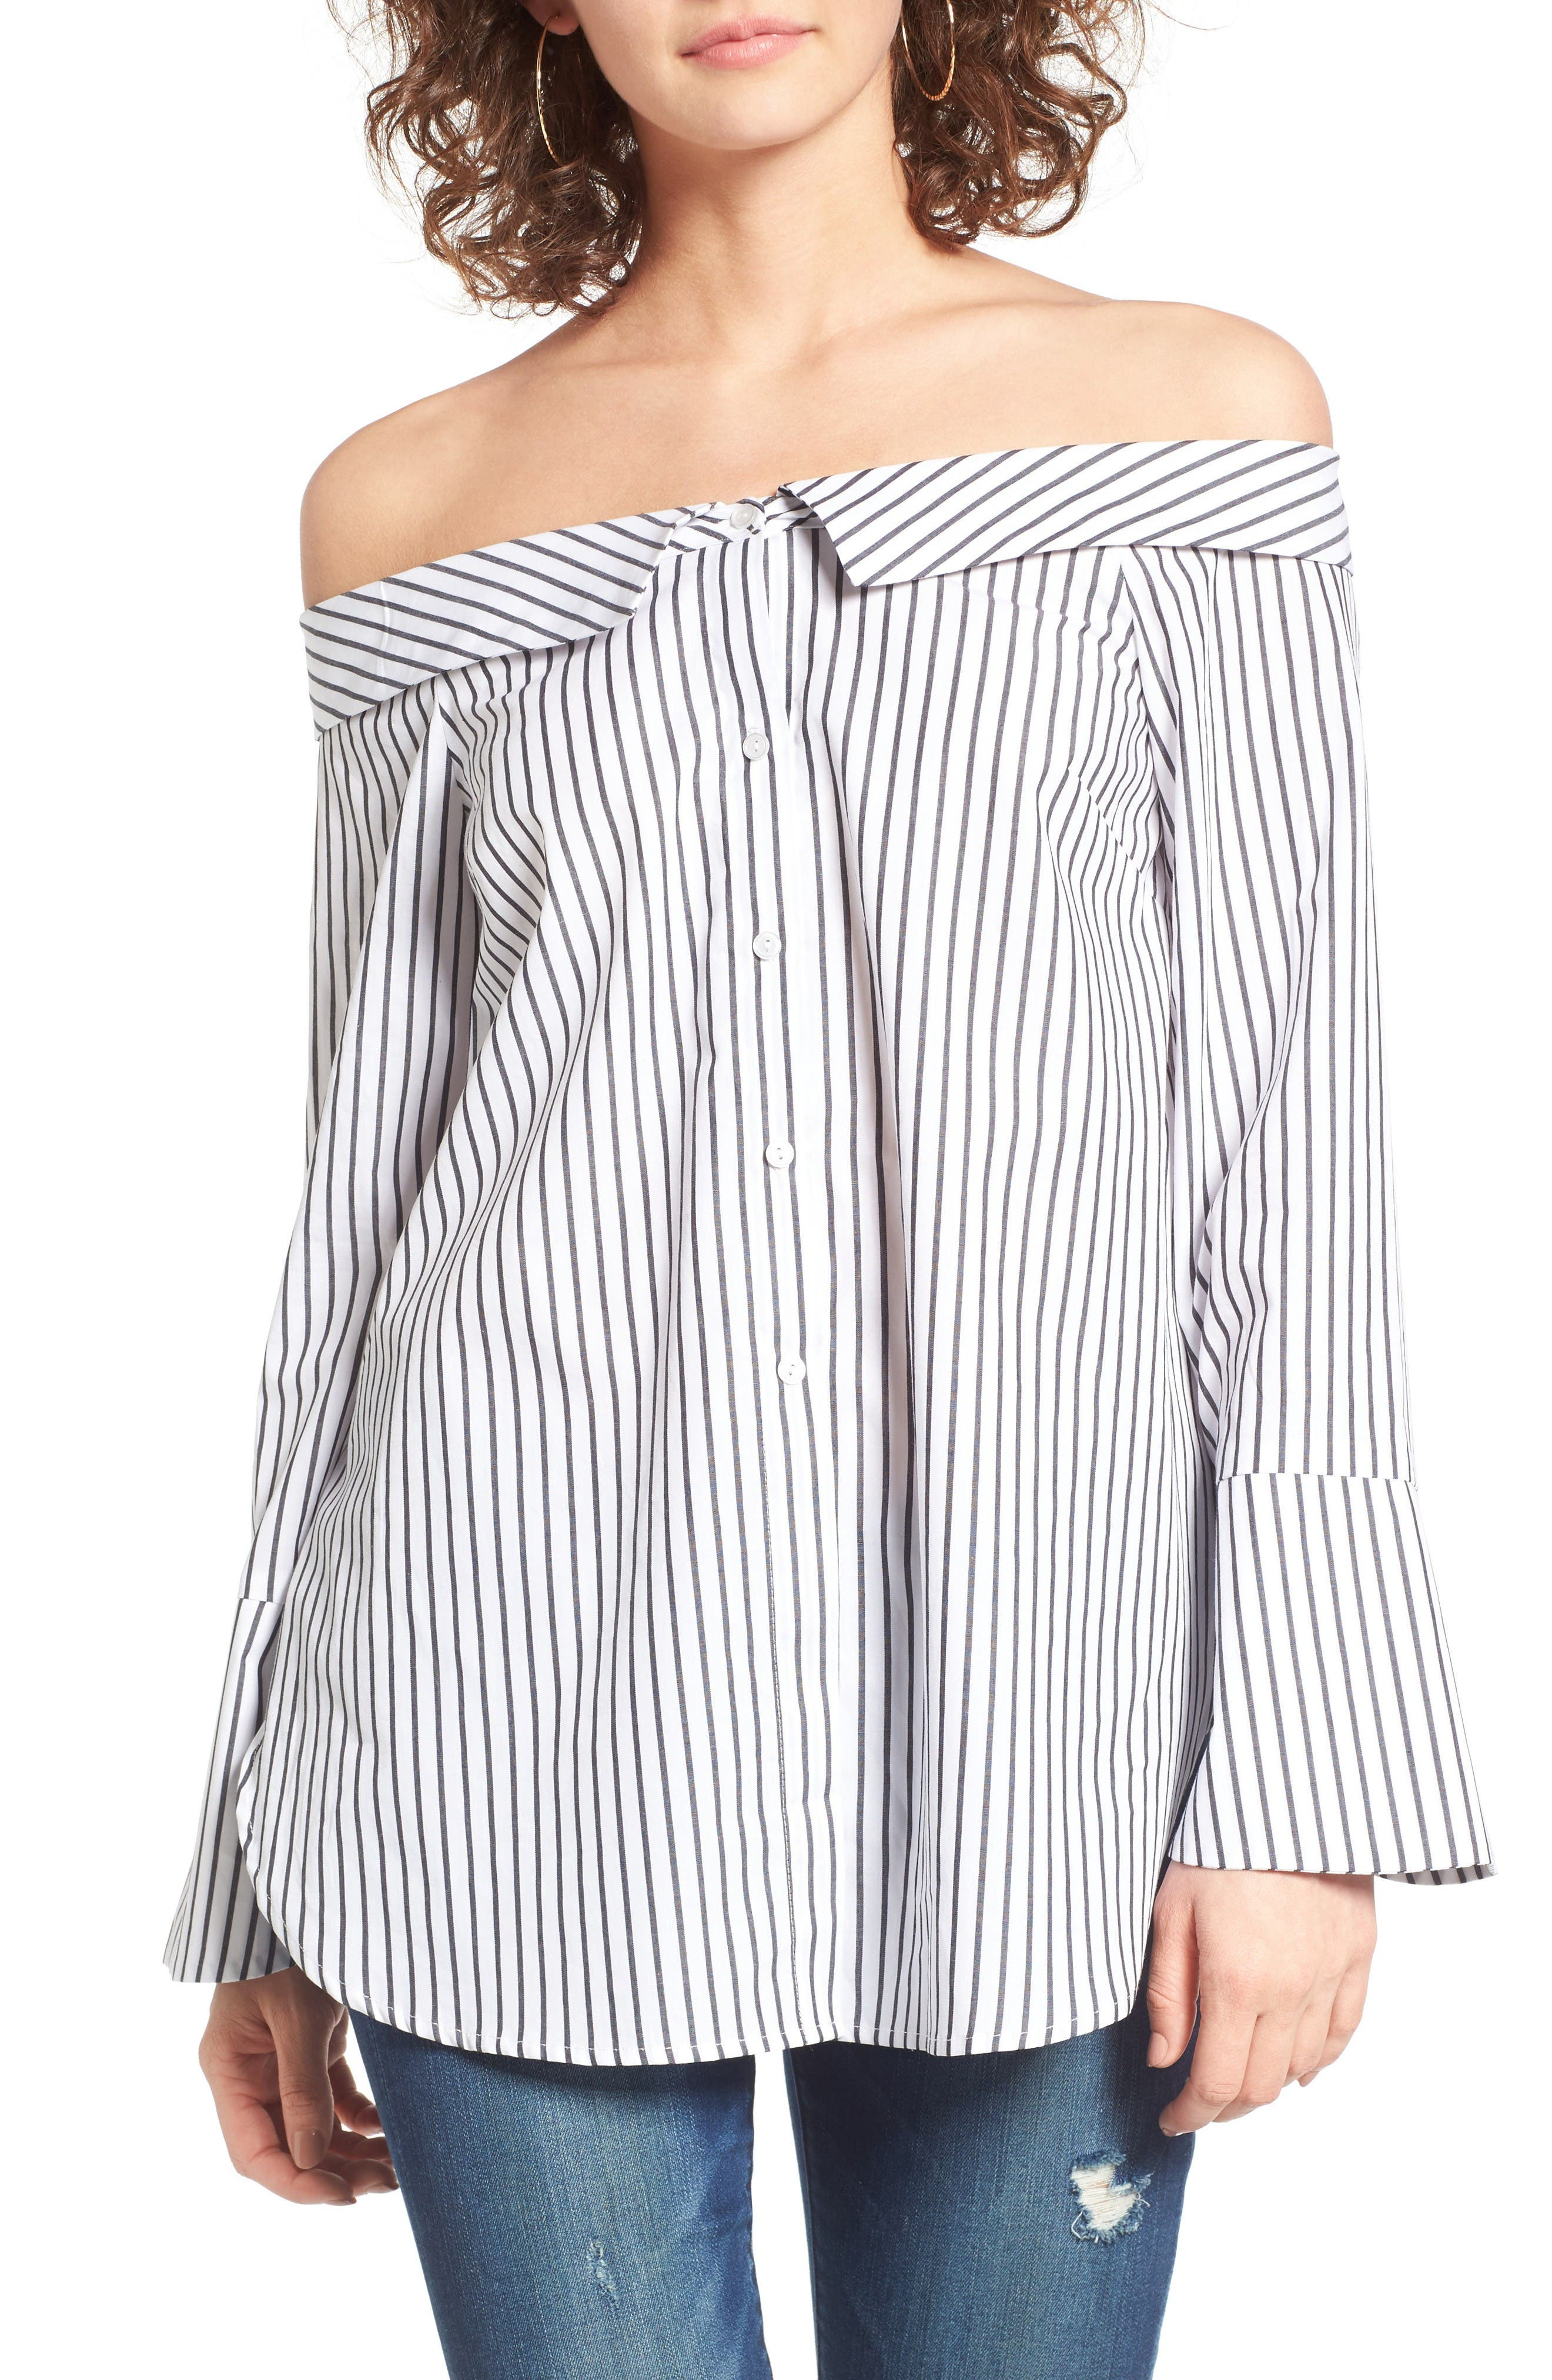 Alternate Image 1 Selected - Lush Stripe Off the Shoulder Top